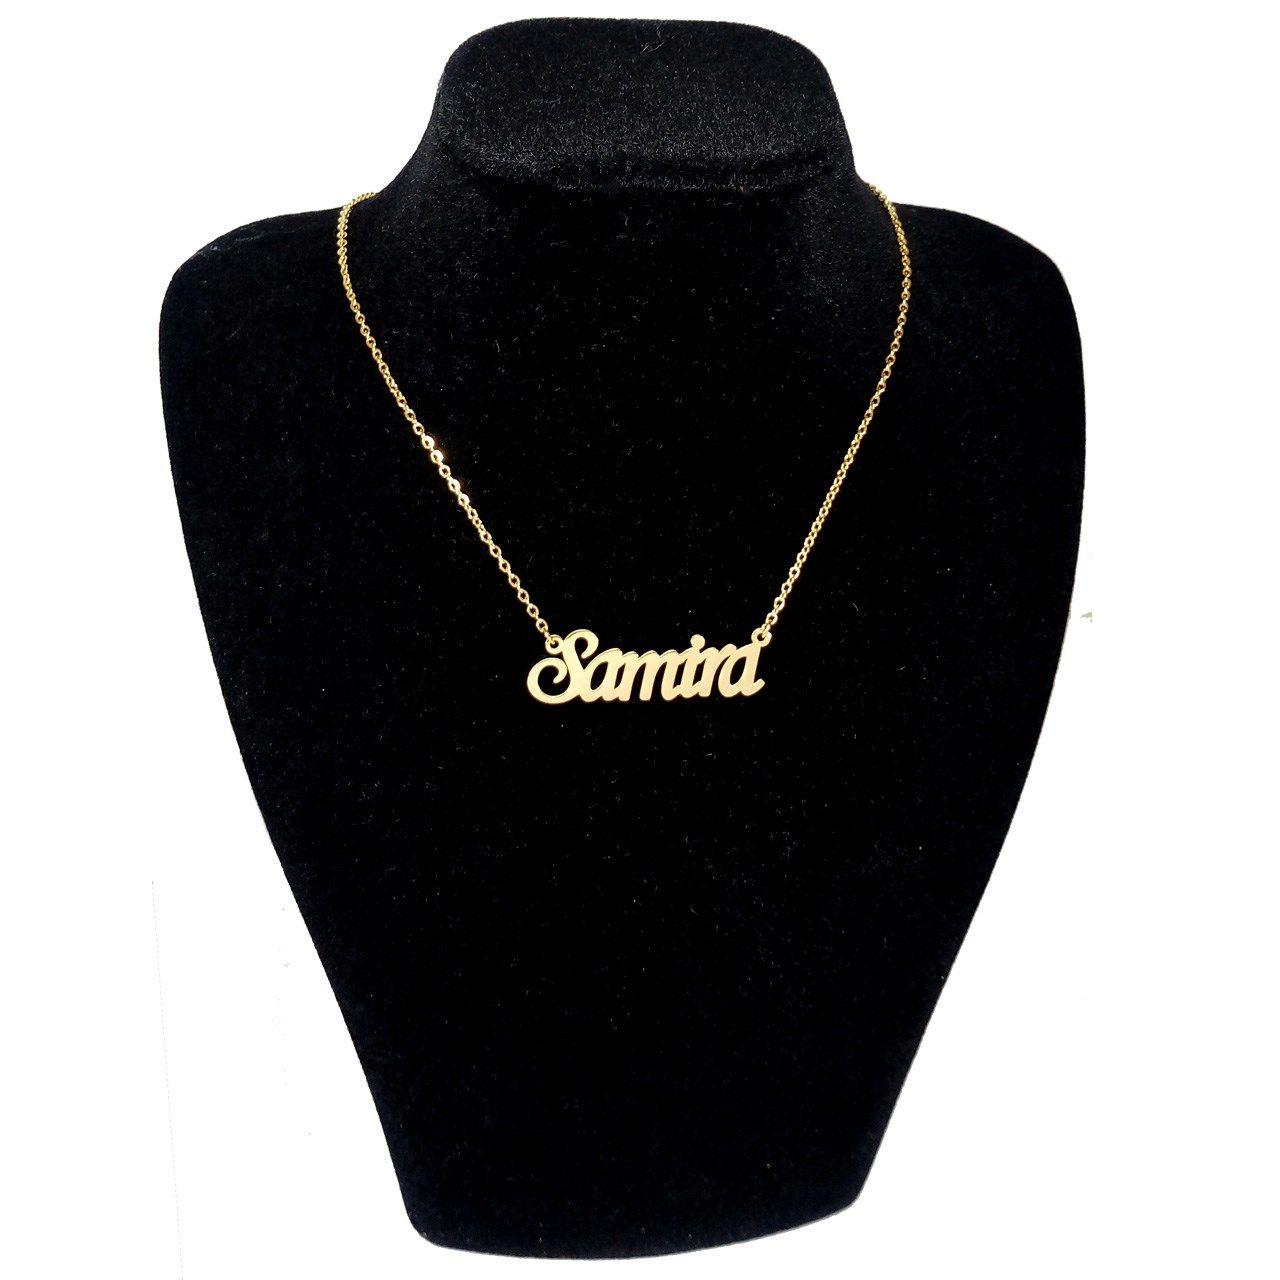 گردنبند آی جواهر طرح سمیرا انگلیسی کد ge1100107 -  - 1